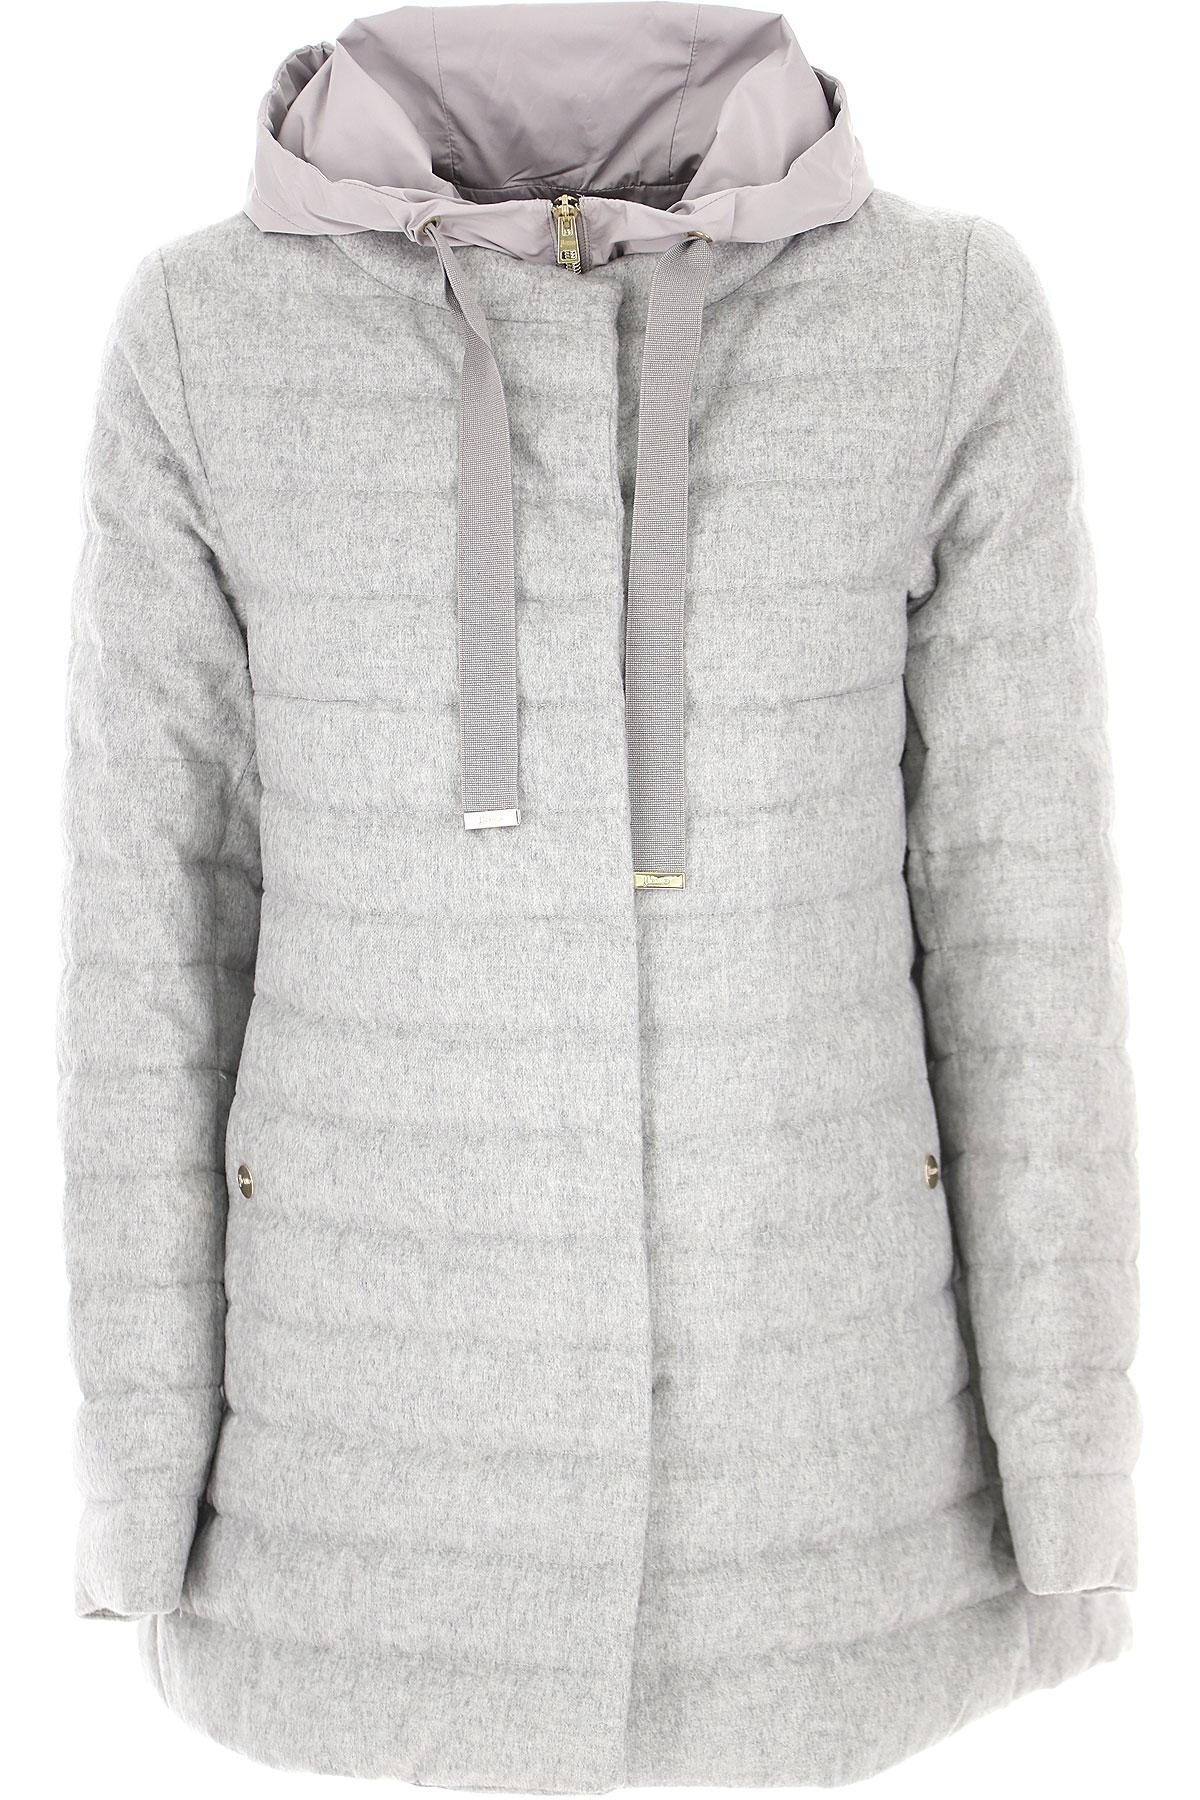 Herno Down Jacket for Women, Puffer Ski Jacket On Sale, Light Grey, Silk, 2019, 10 12 8